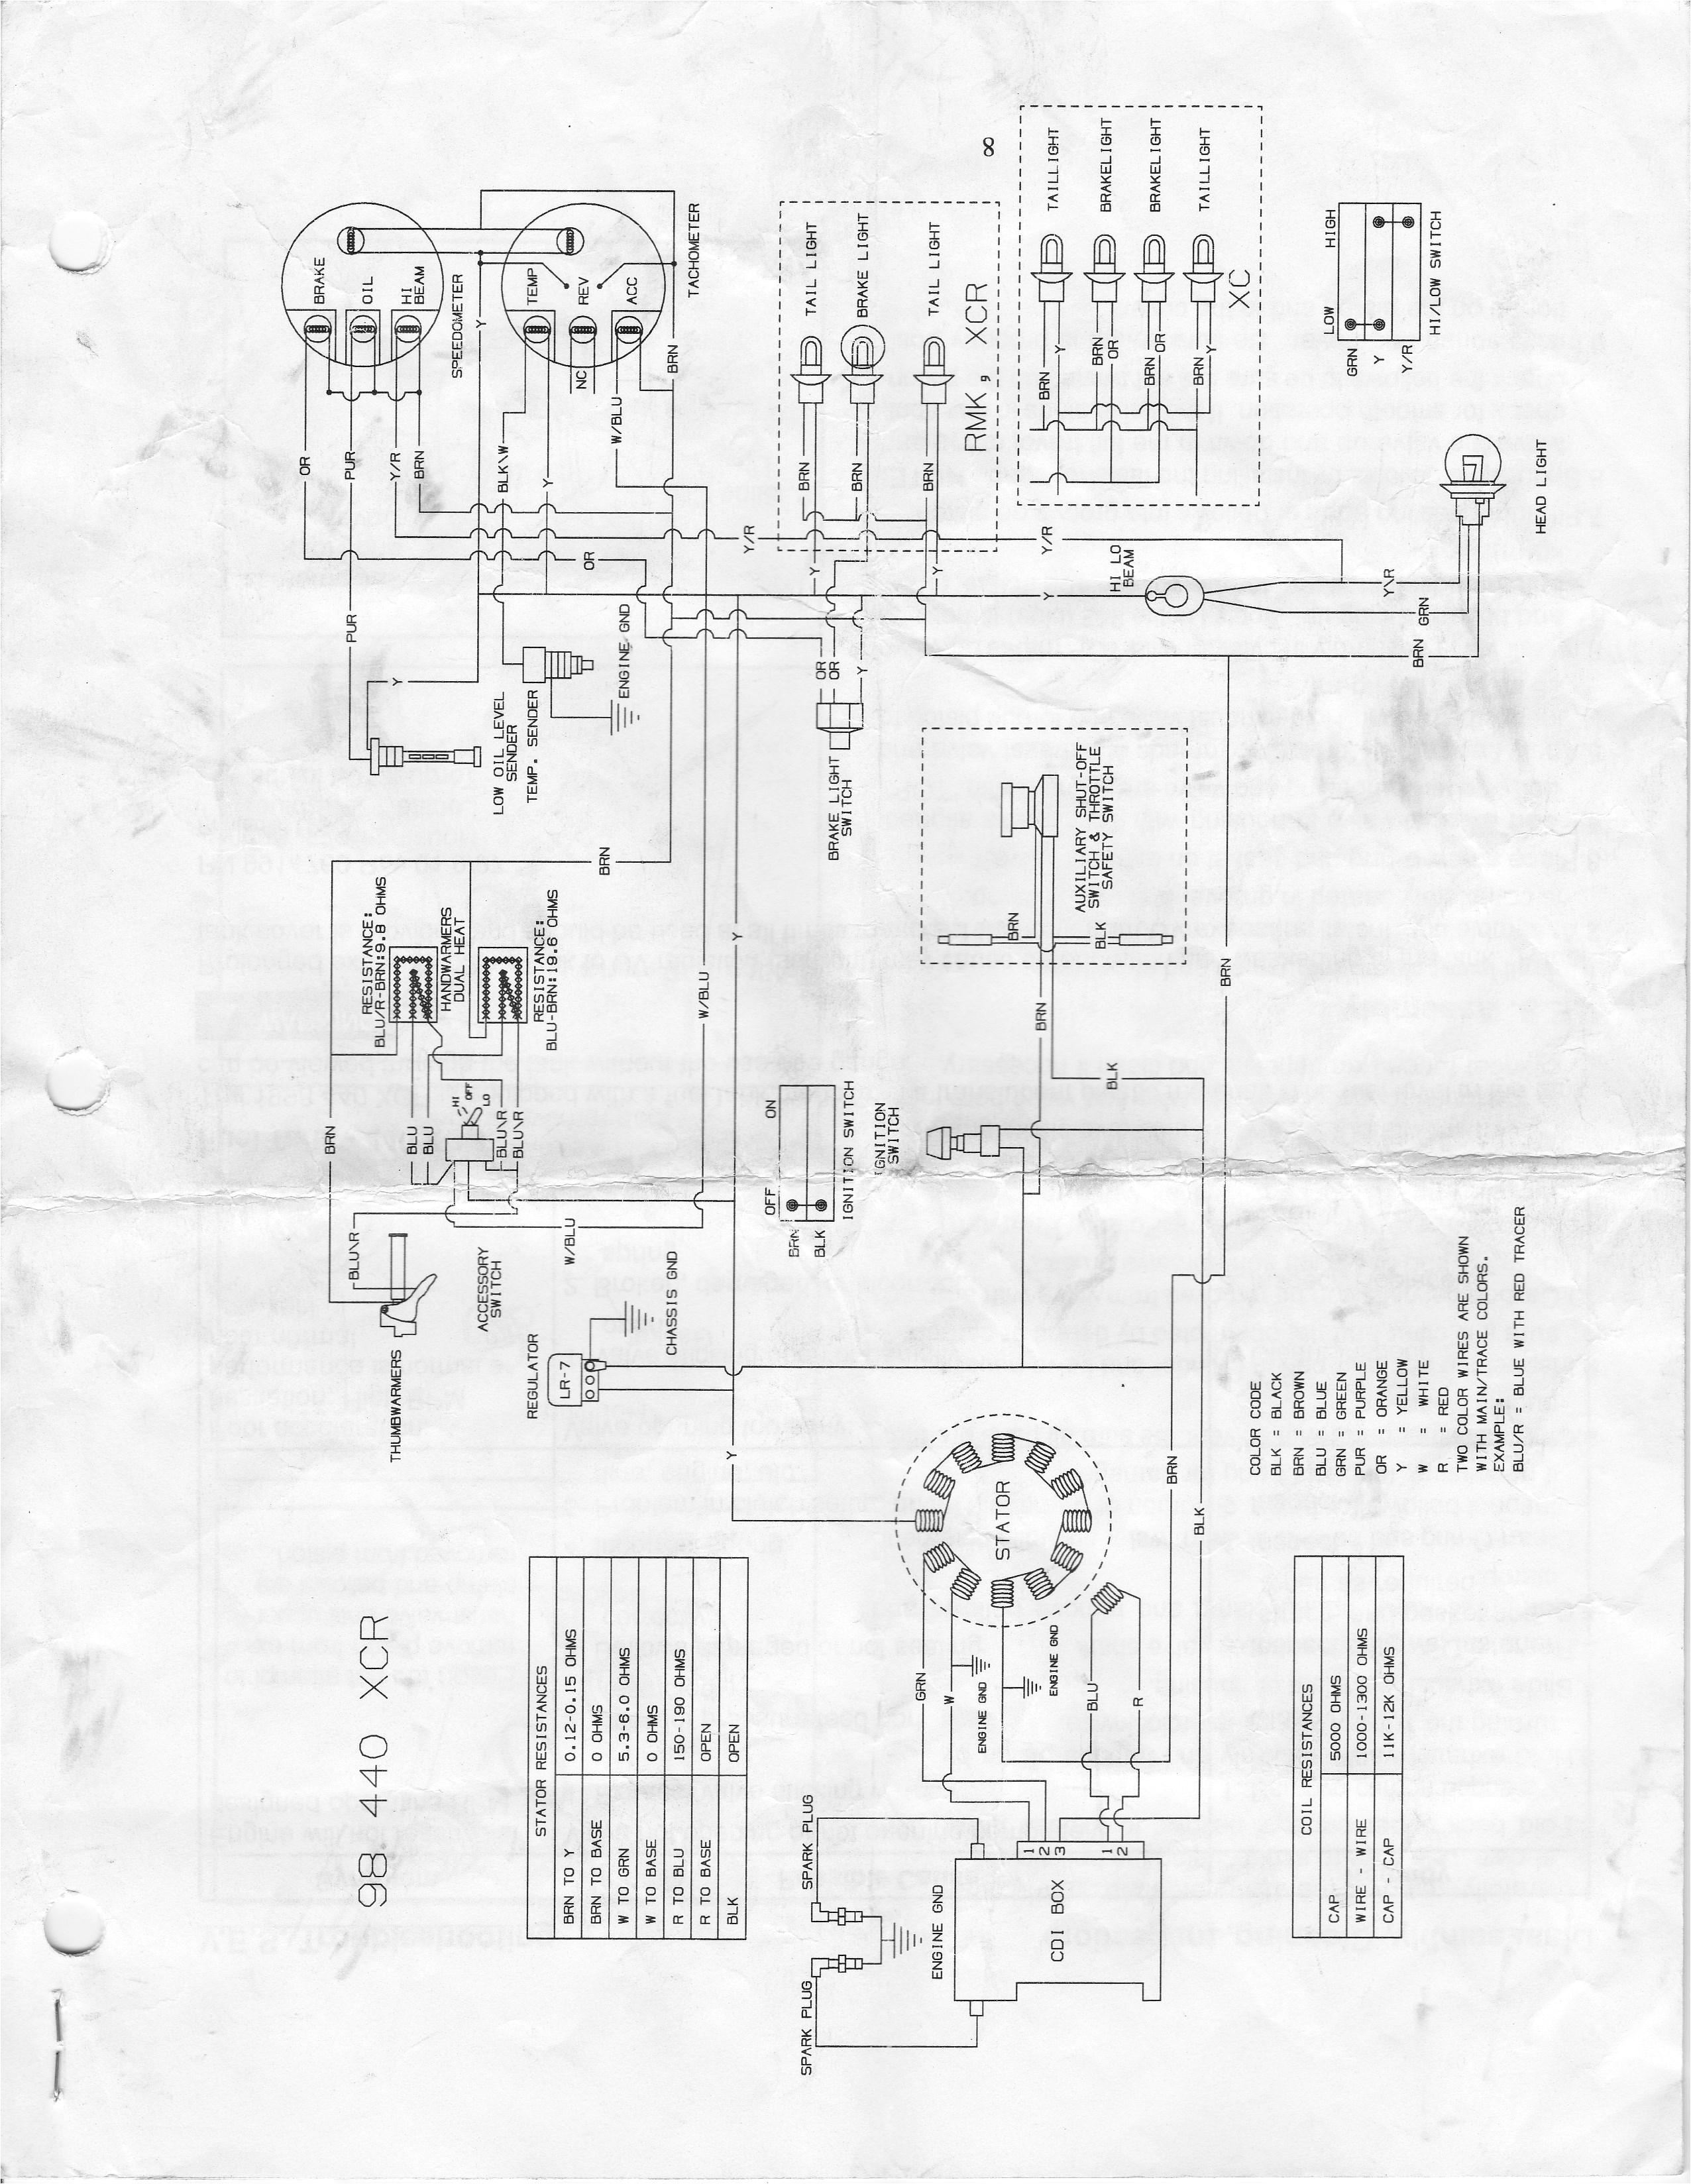 polaris trailblazer 250 wiring diagram 9 10 nuerasolar co u2022 2001 polaris trailblazer 250 wiring polaris trailblazer 250 wiring diagram online wiring